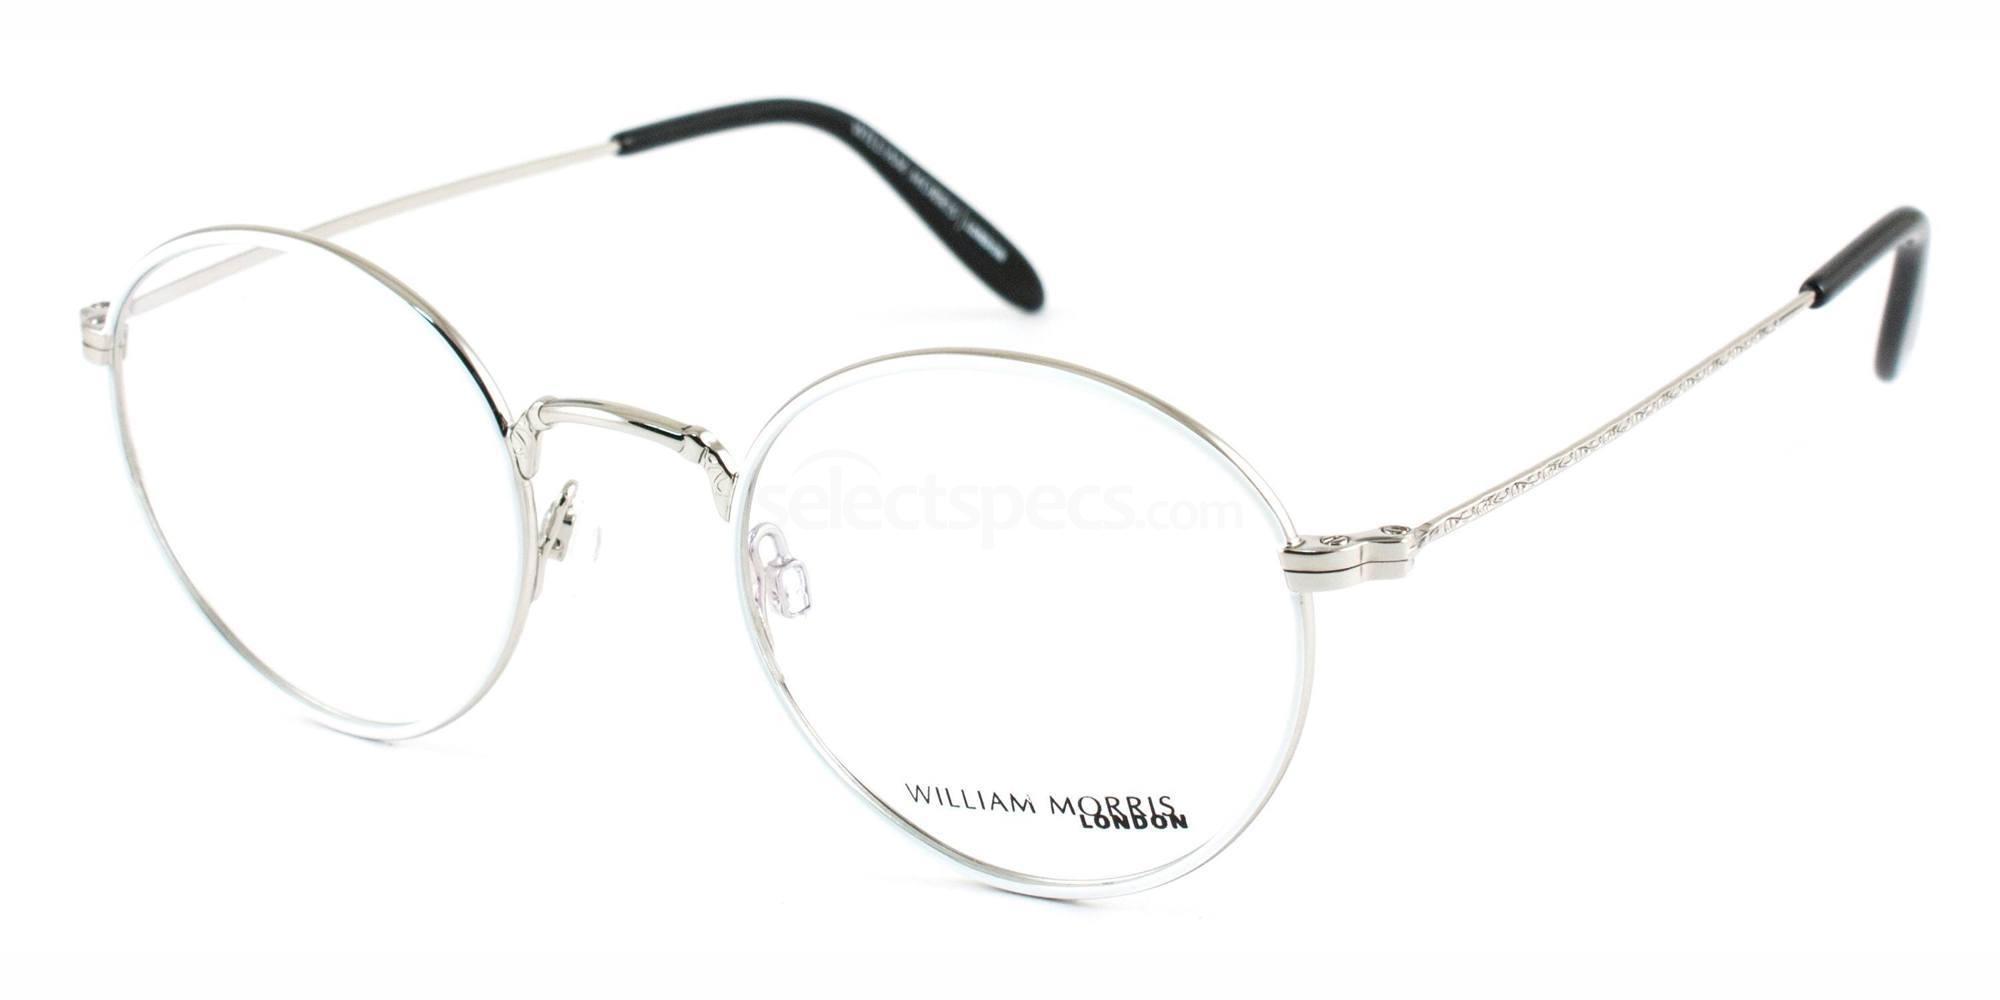 0c4447fb24 william morris free available via PricePi.com. Shop the entire ...